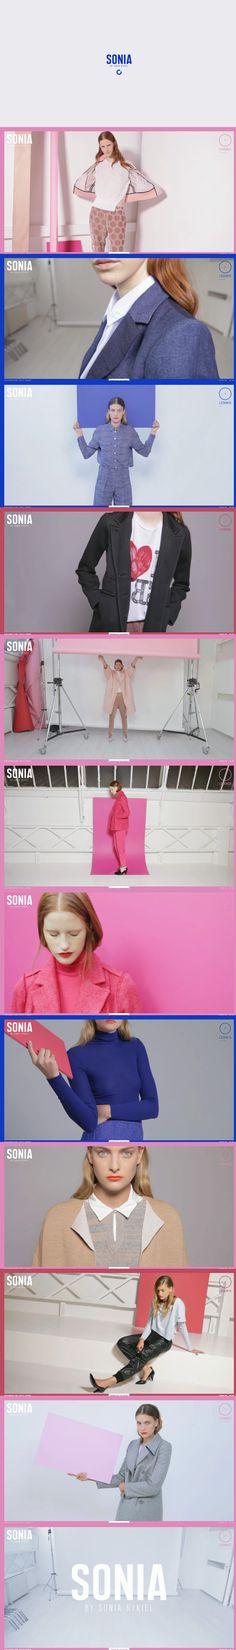 SONIA BY, 1 August 2013. http://www.awwwards.com/web-design-awards/sonia-by   #Fashion #Fullscreen #HTML5 #Video #Design